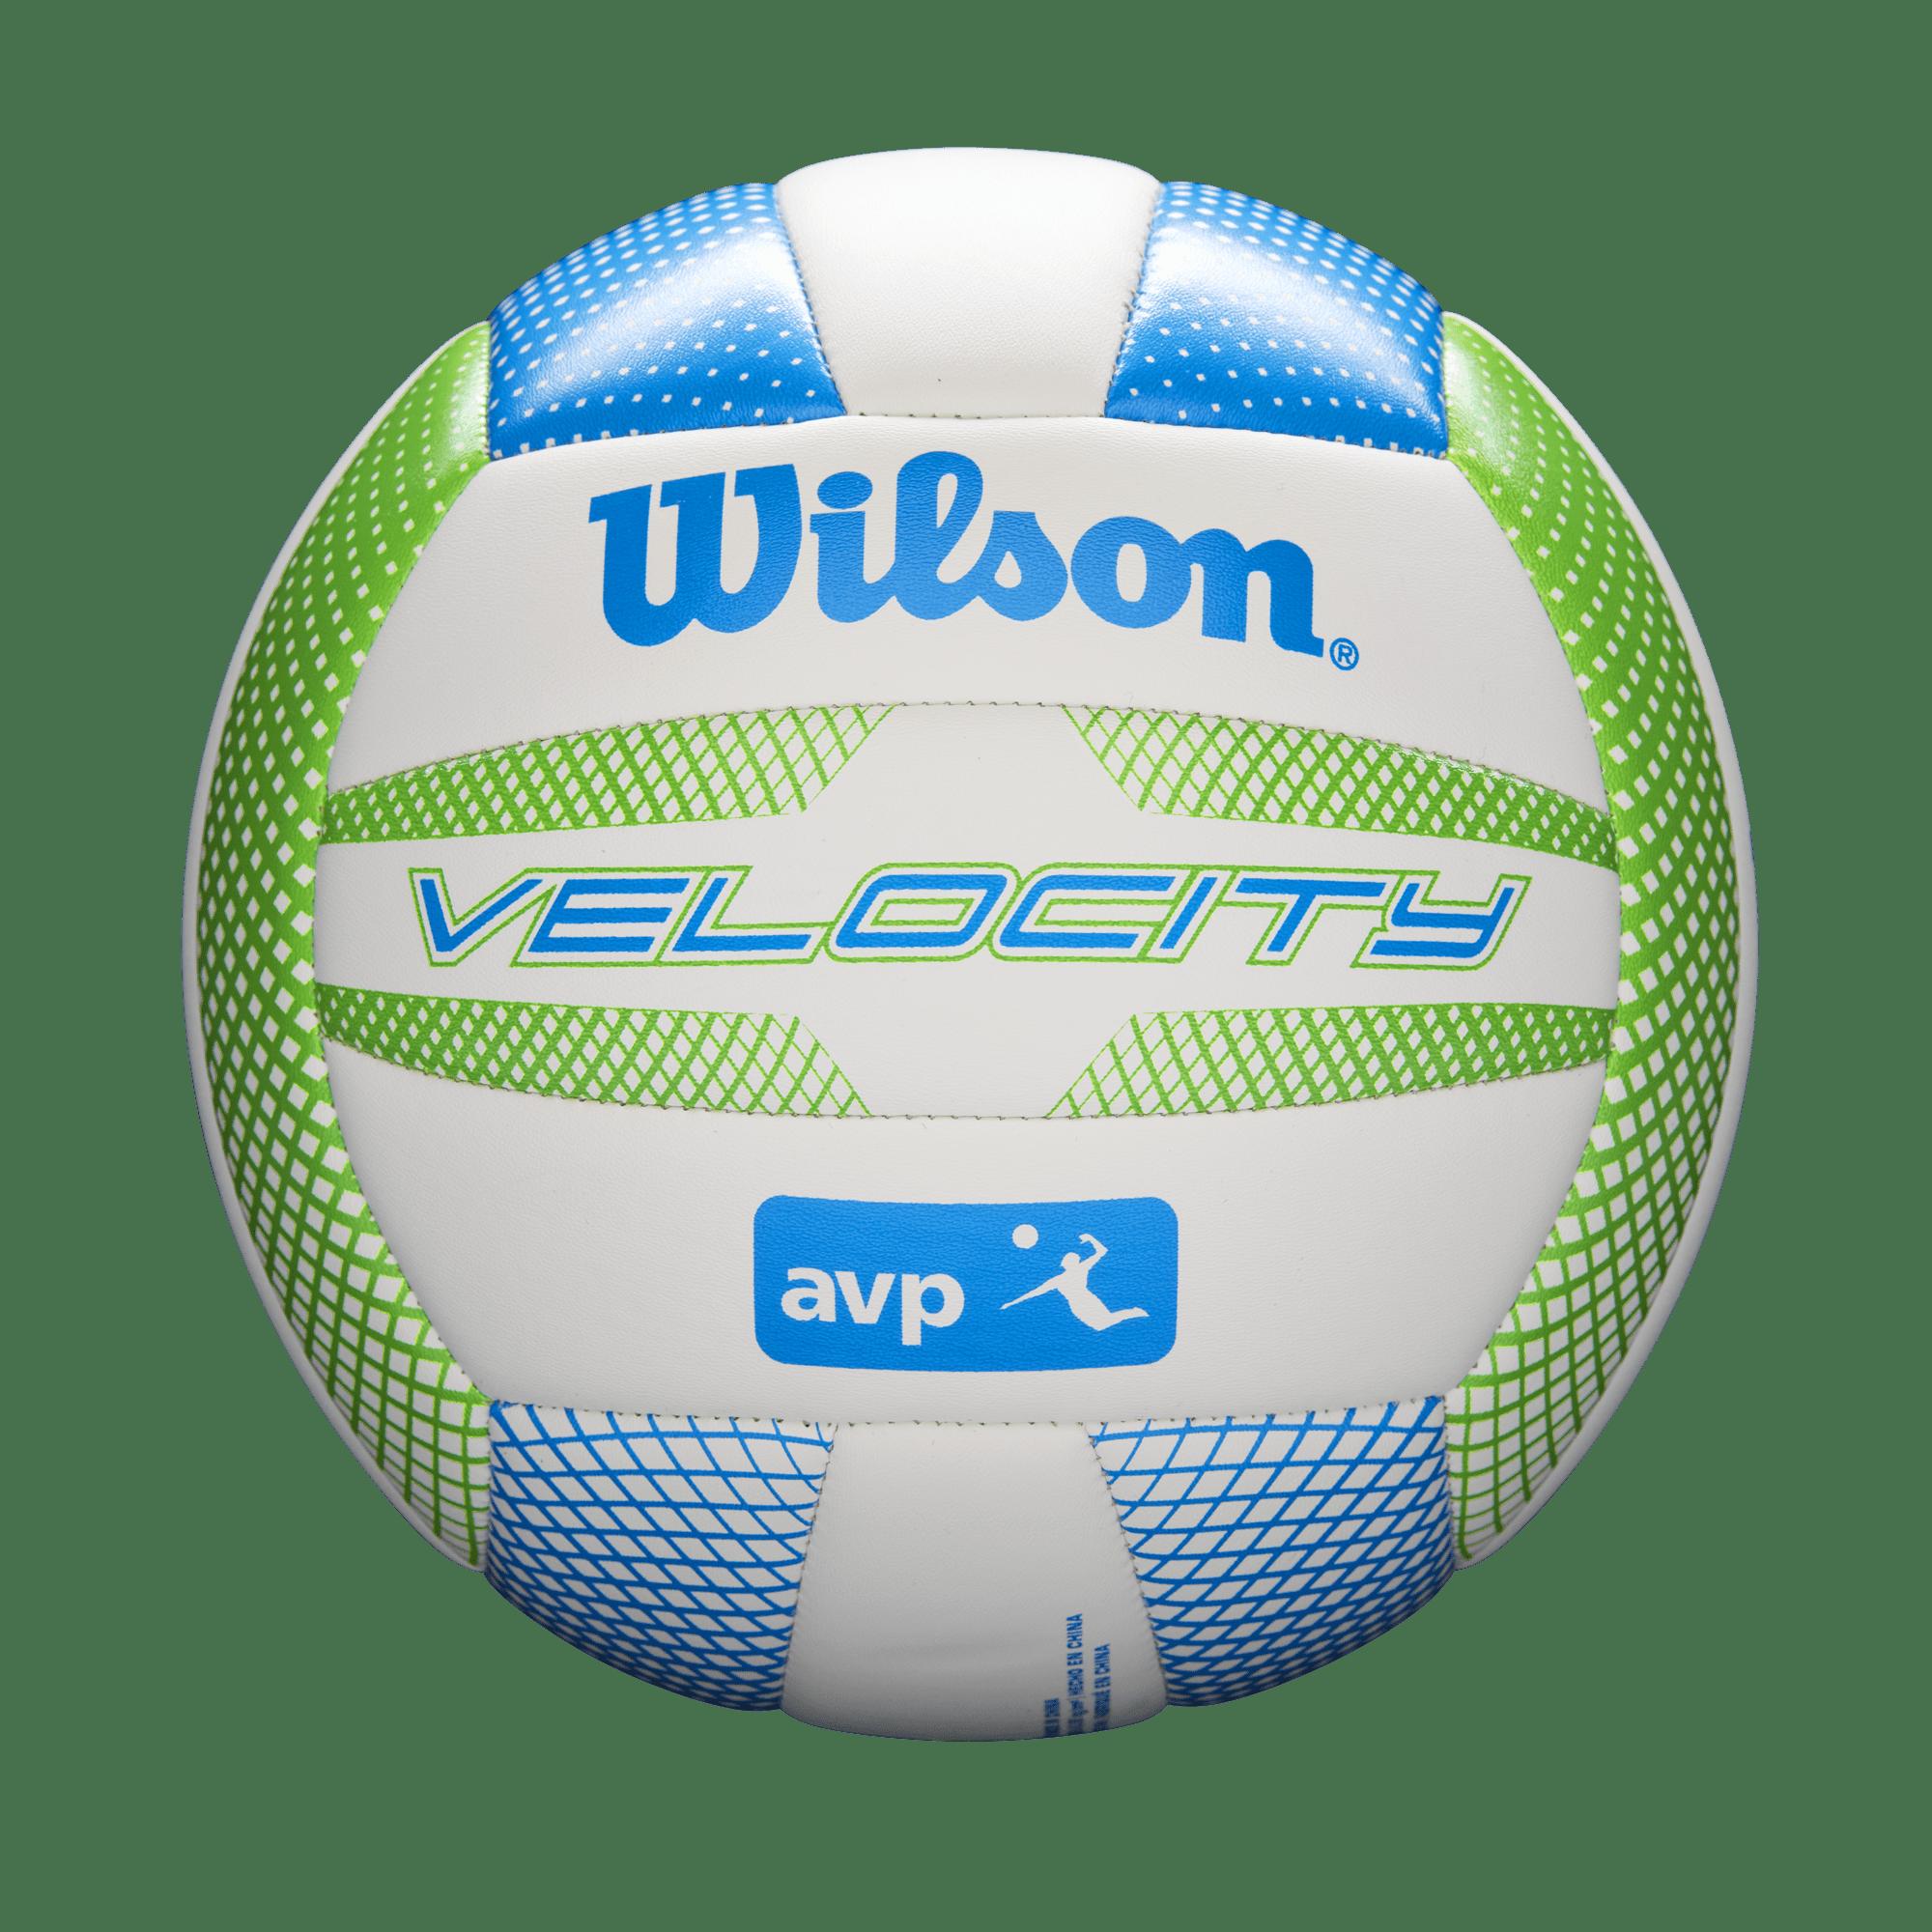 Wilson AVP Velocity Volleyball, Green